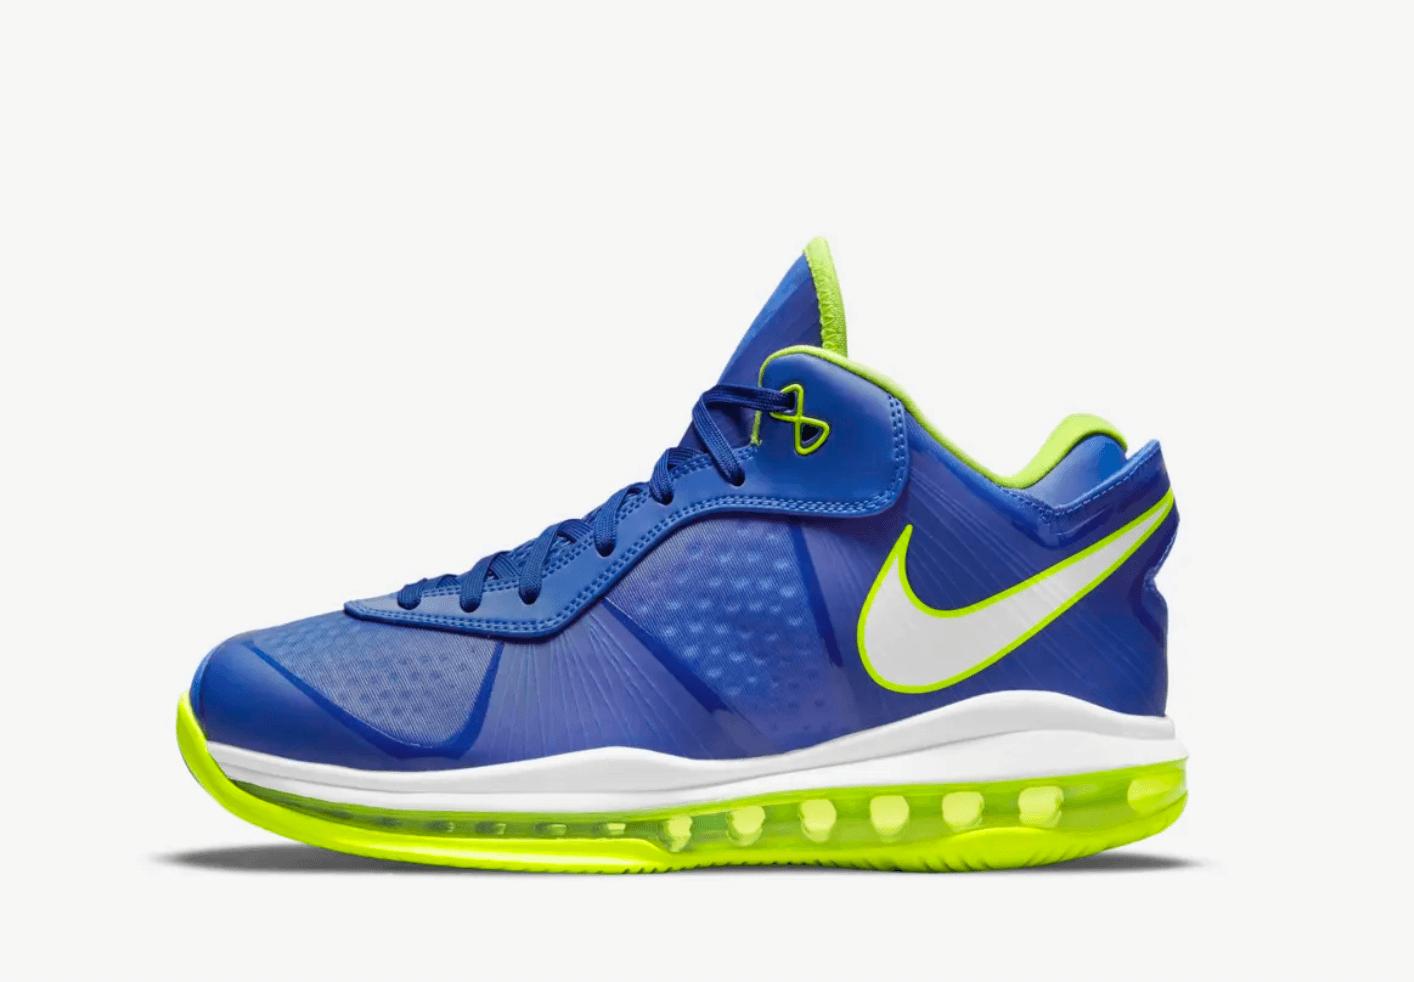 zapatillas Nike Lebron 8 V/2 low Treasure Blue 2021